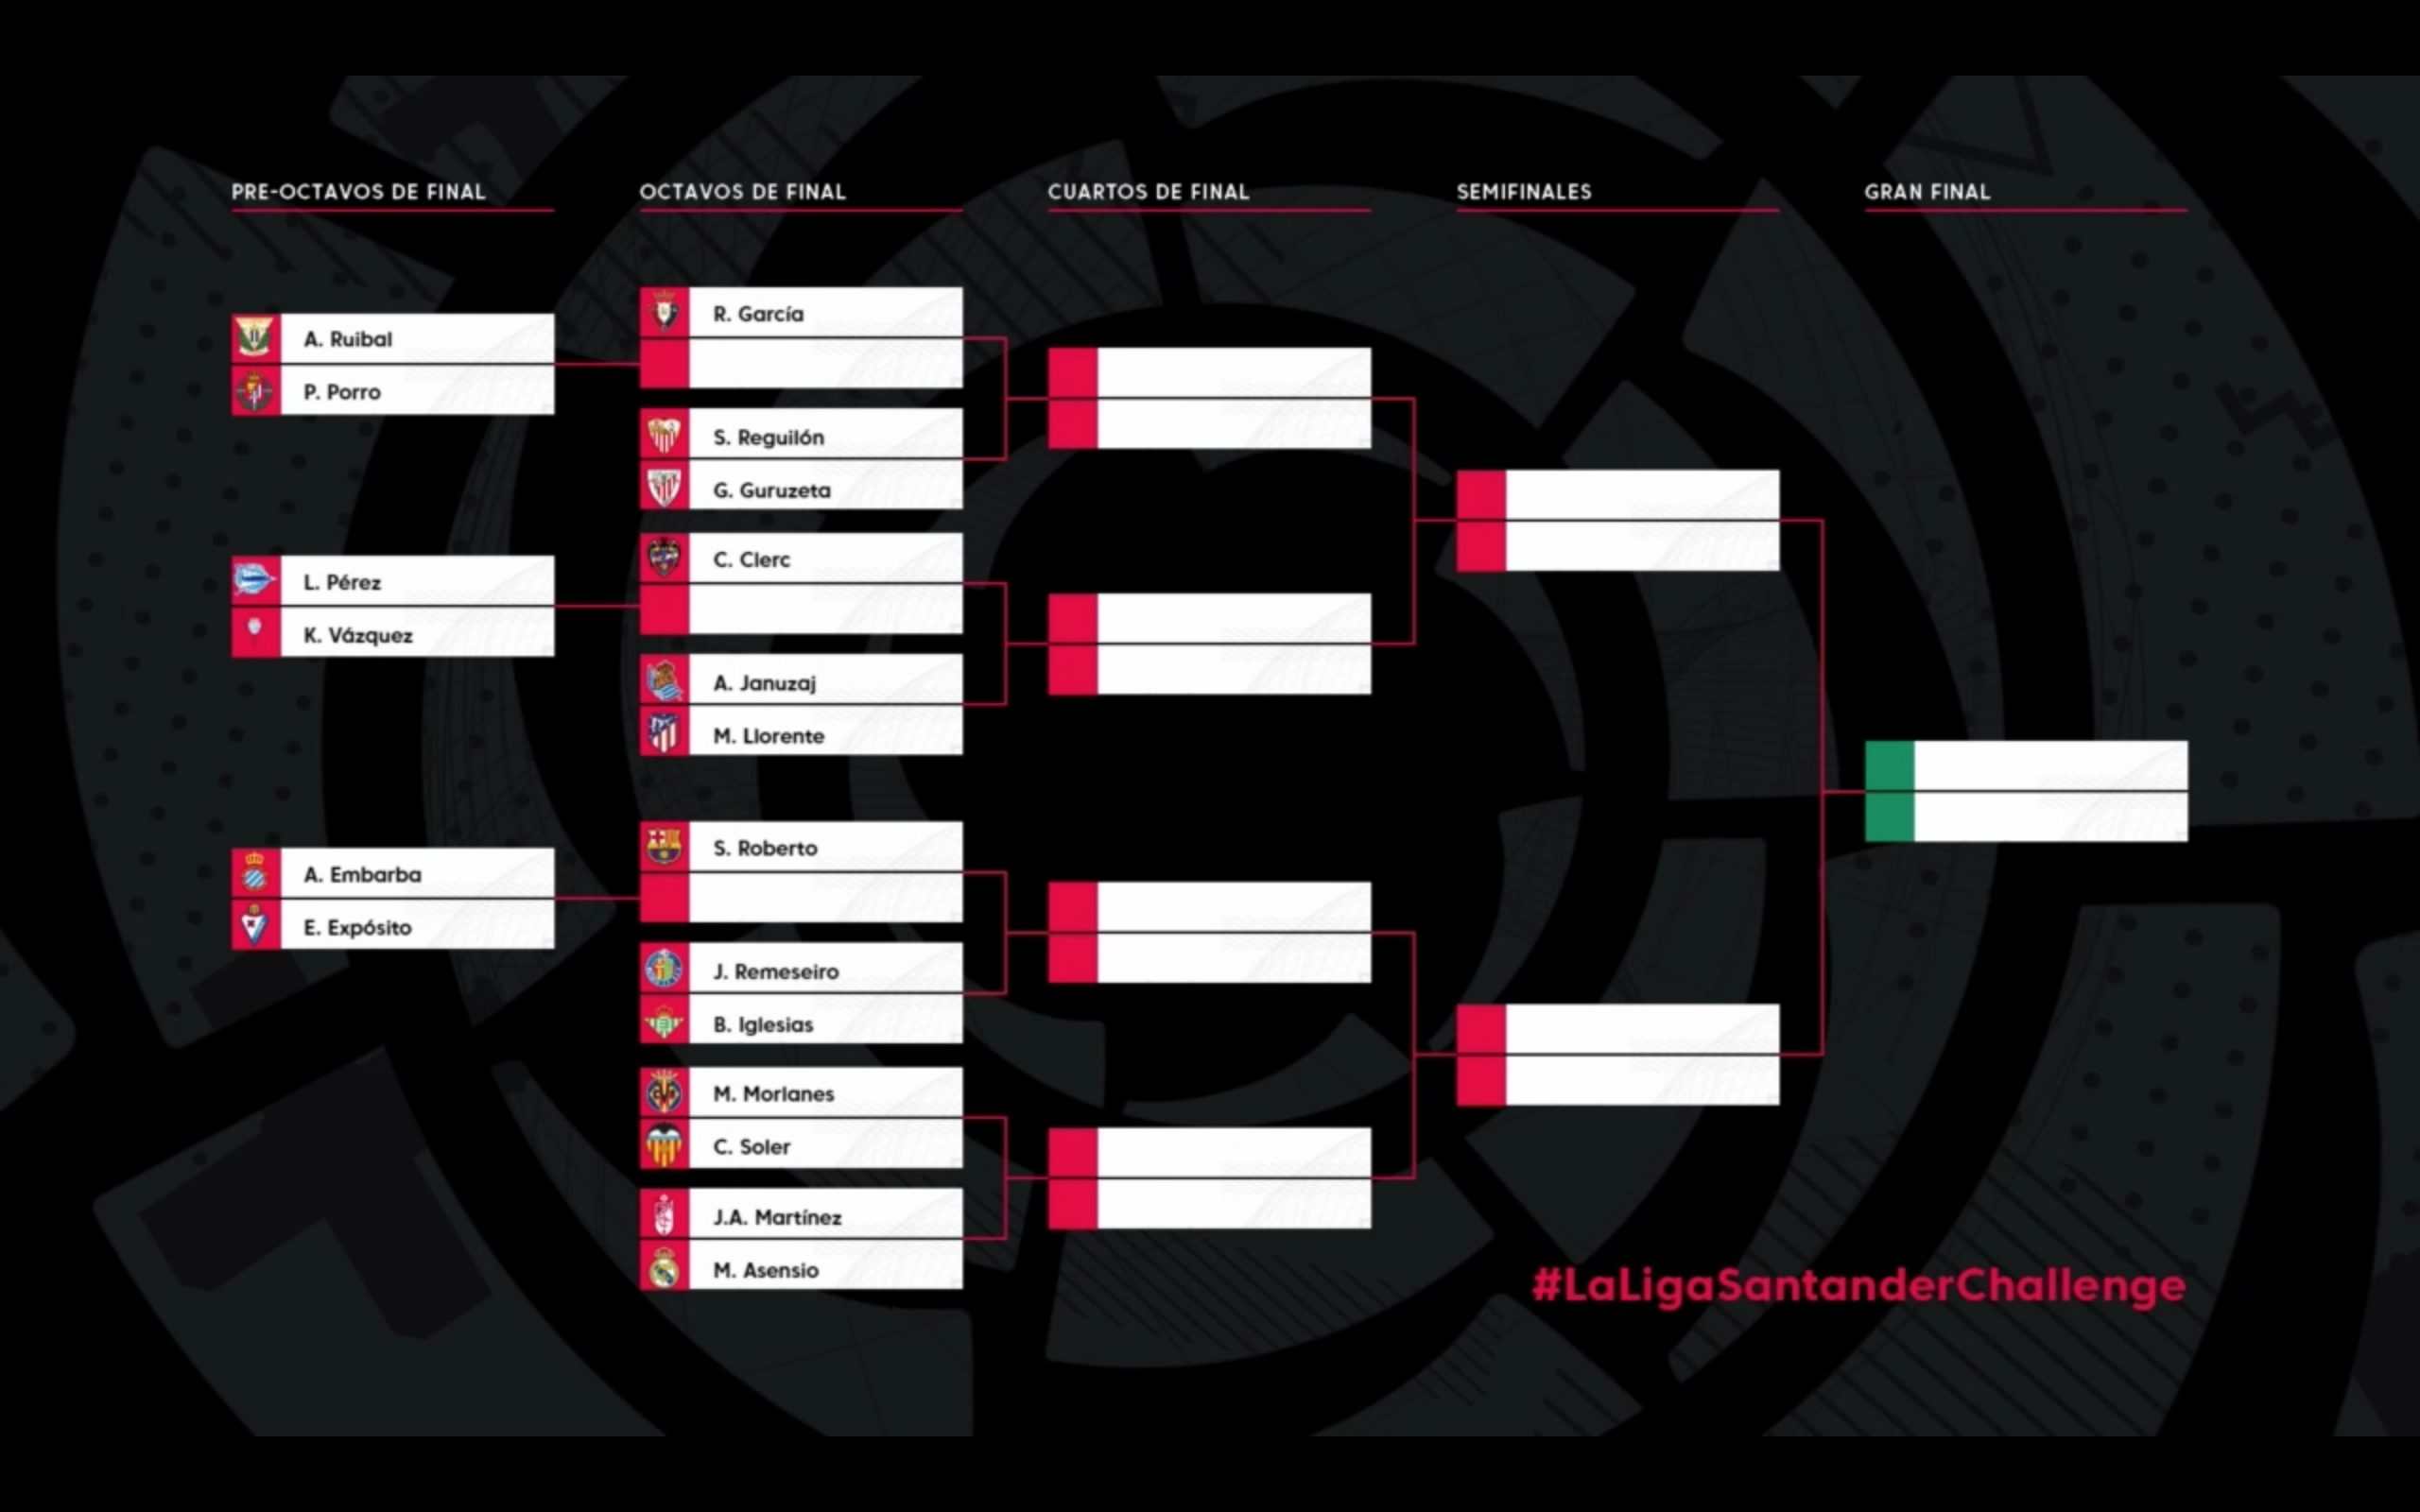 FIFA 20 La Liga Santander Challenge Betting Odds